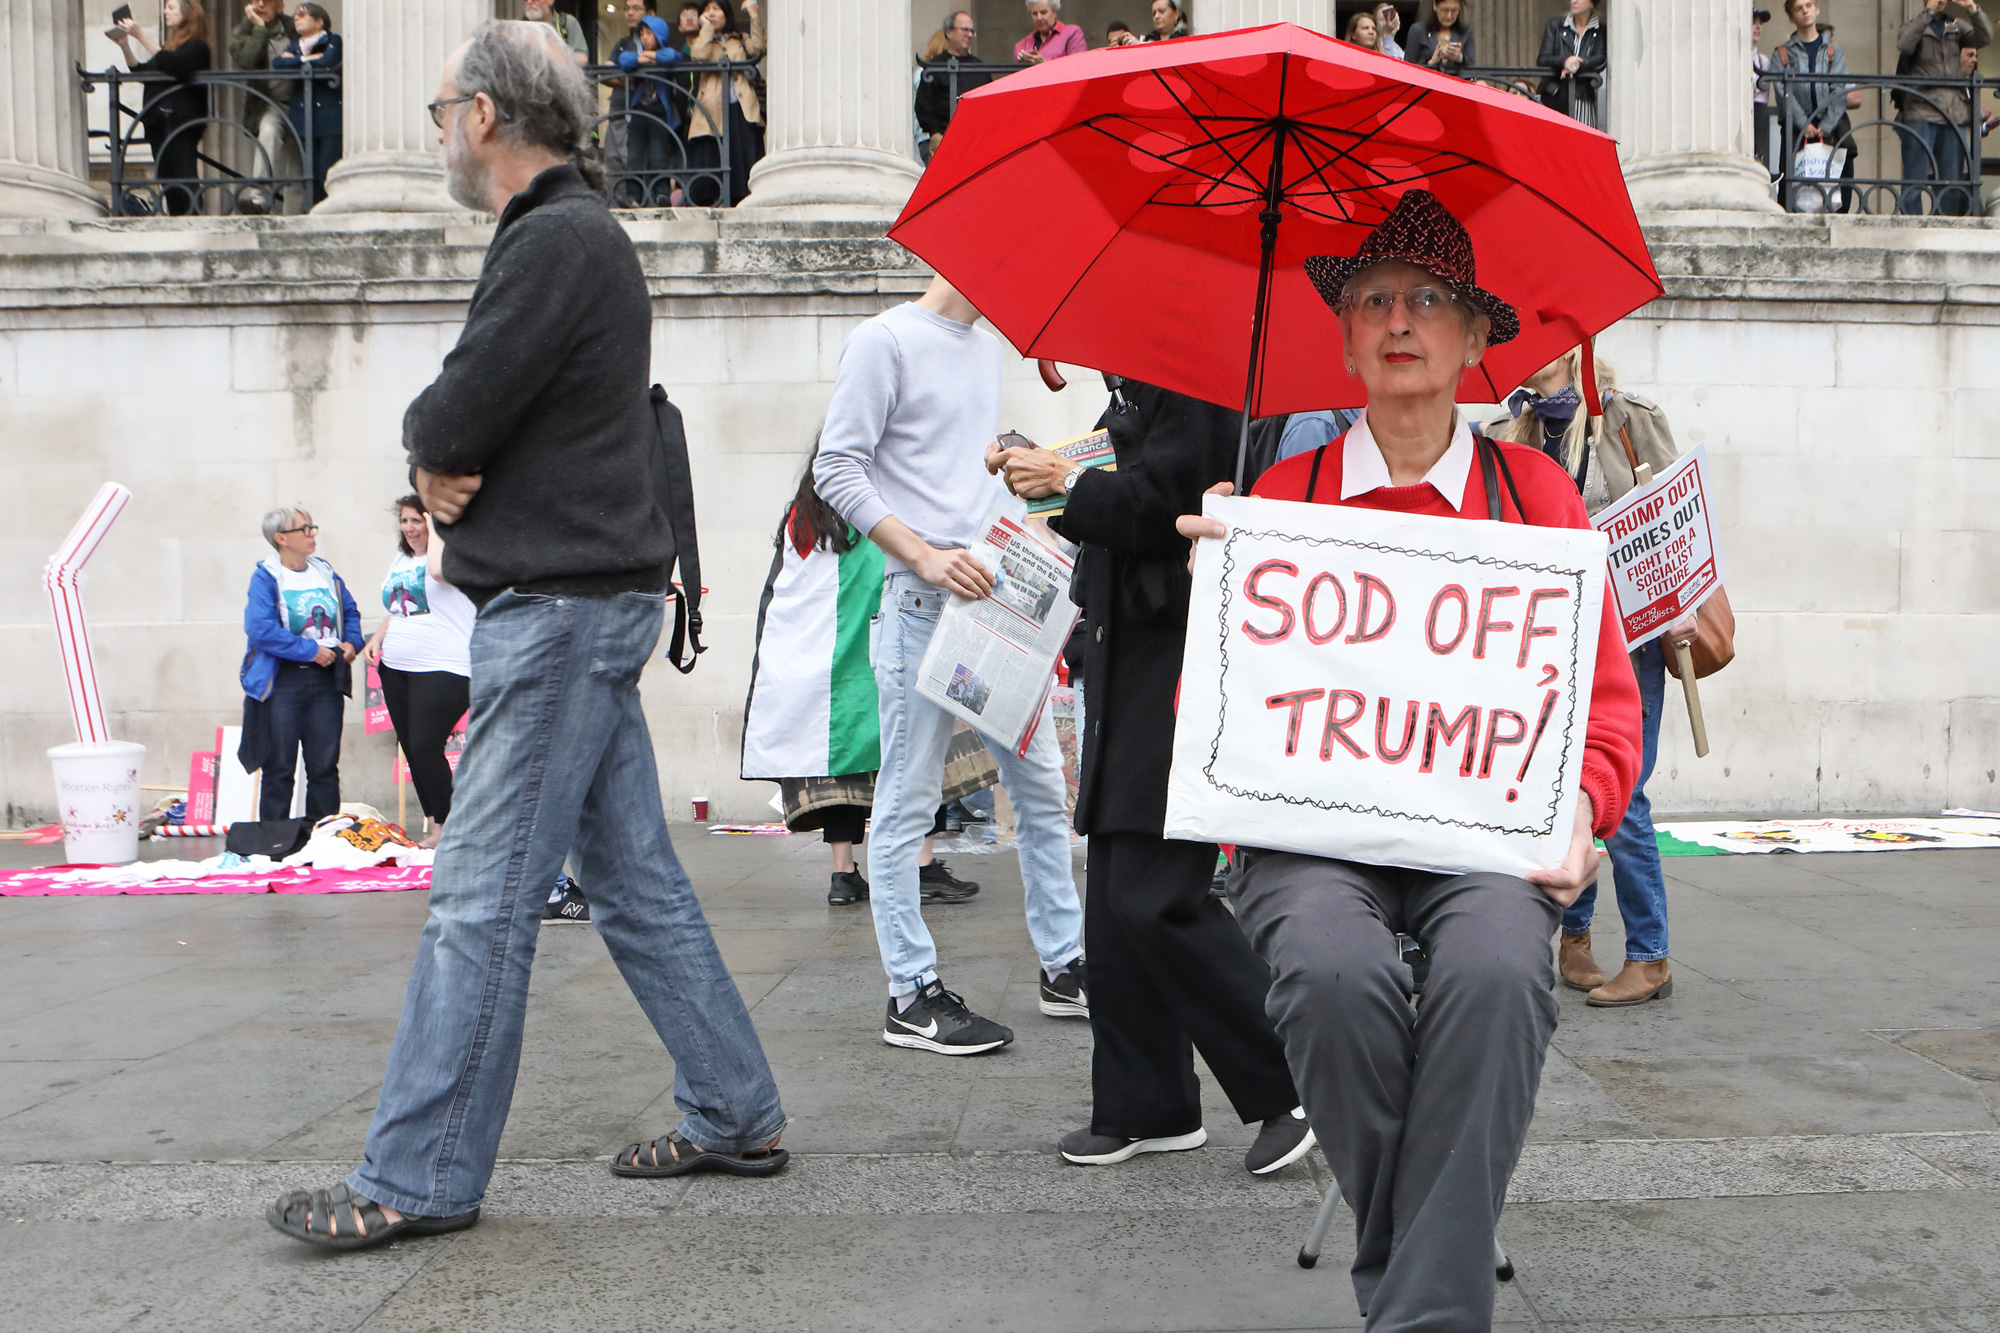 Anti-Trump March, London 2019